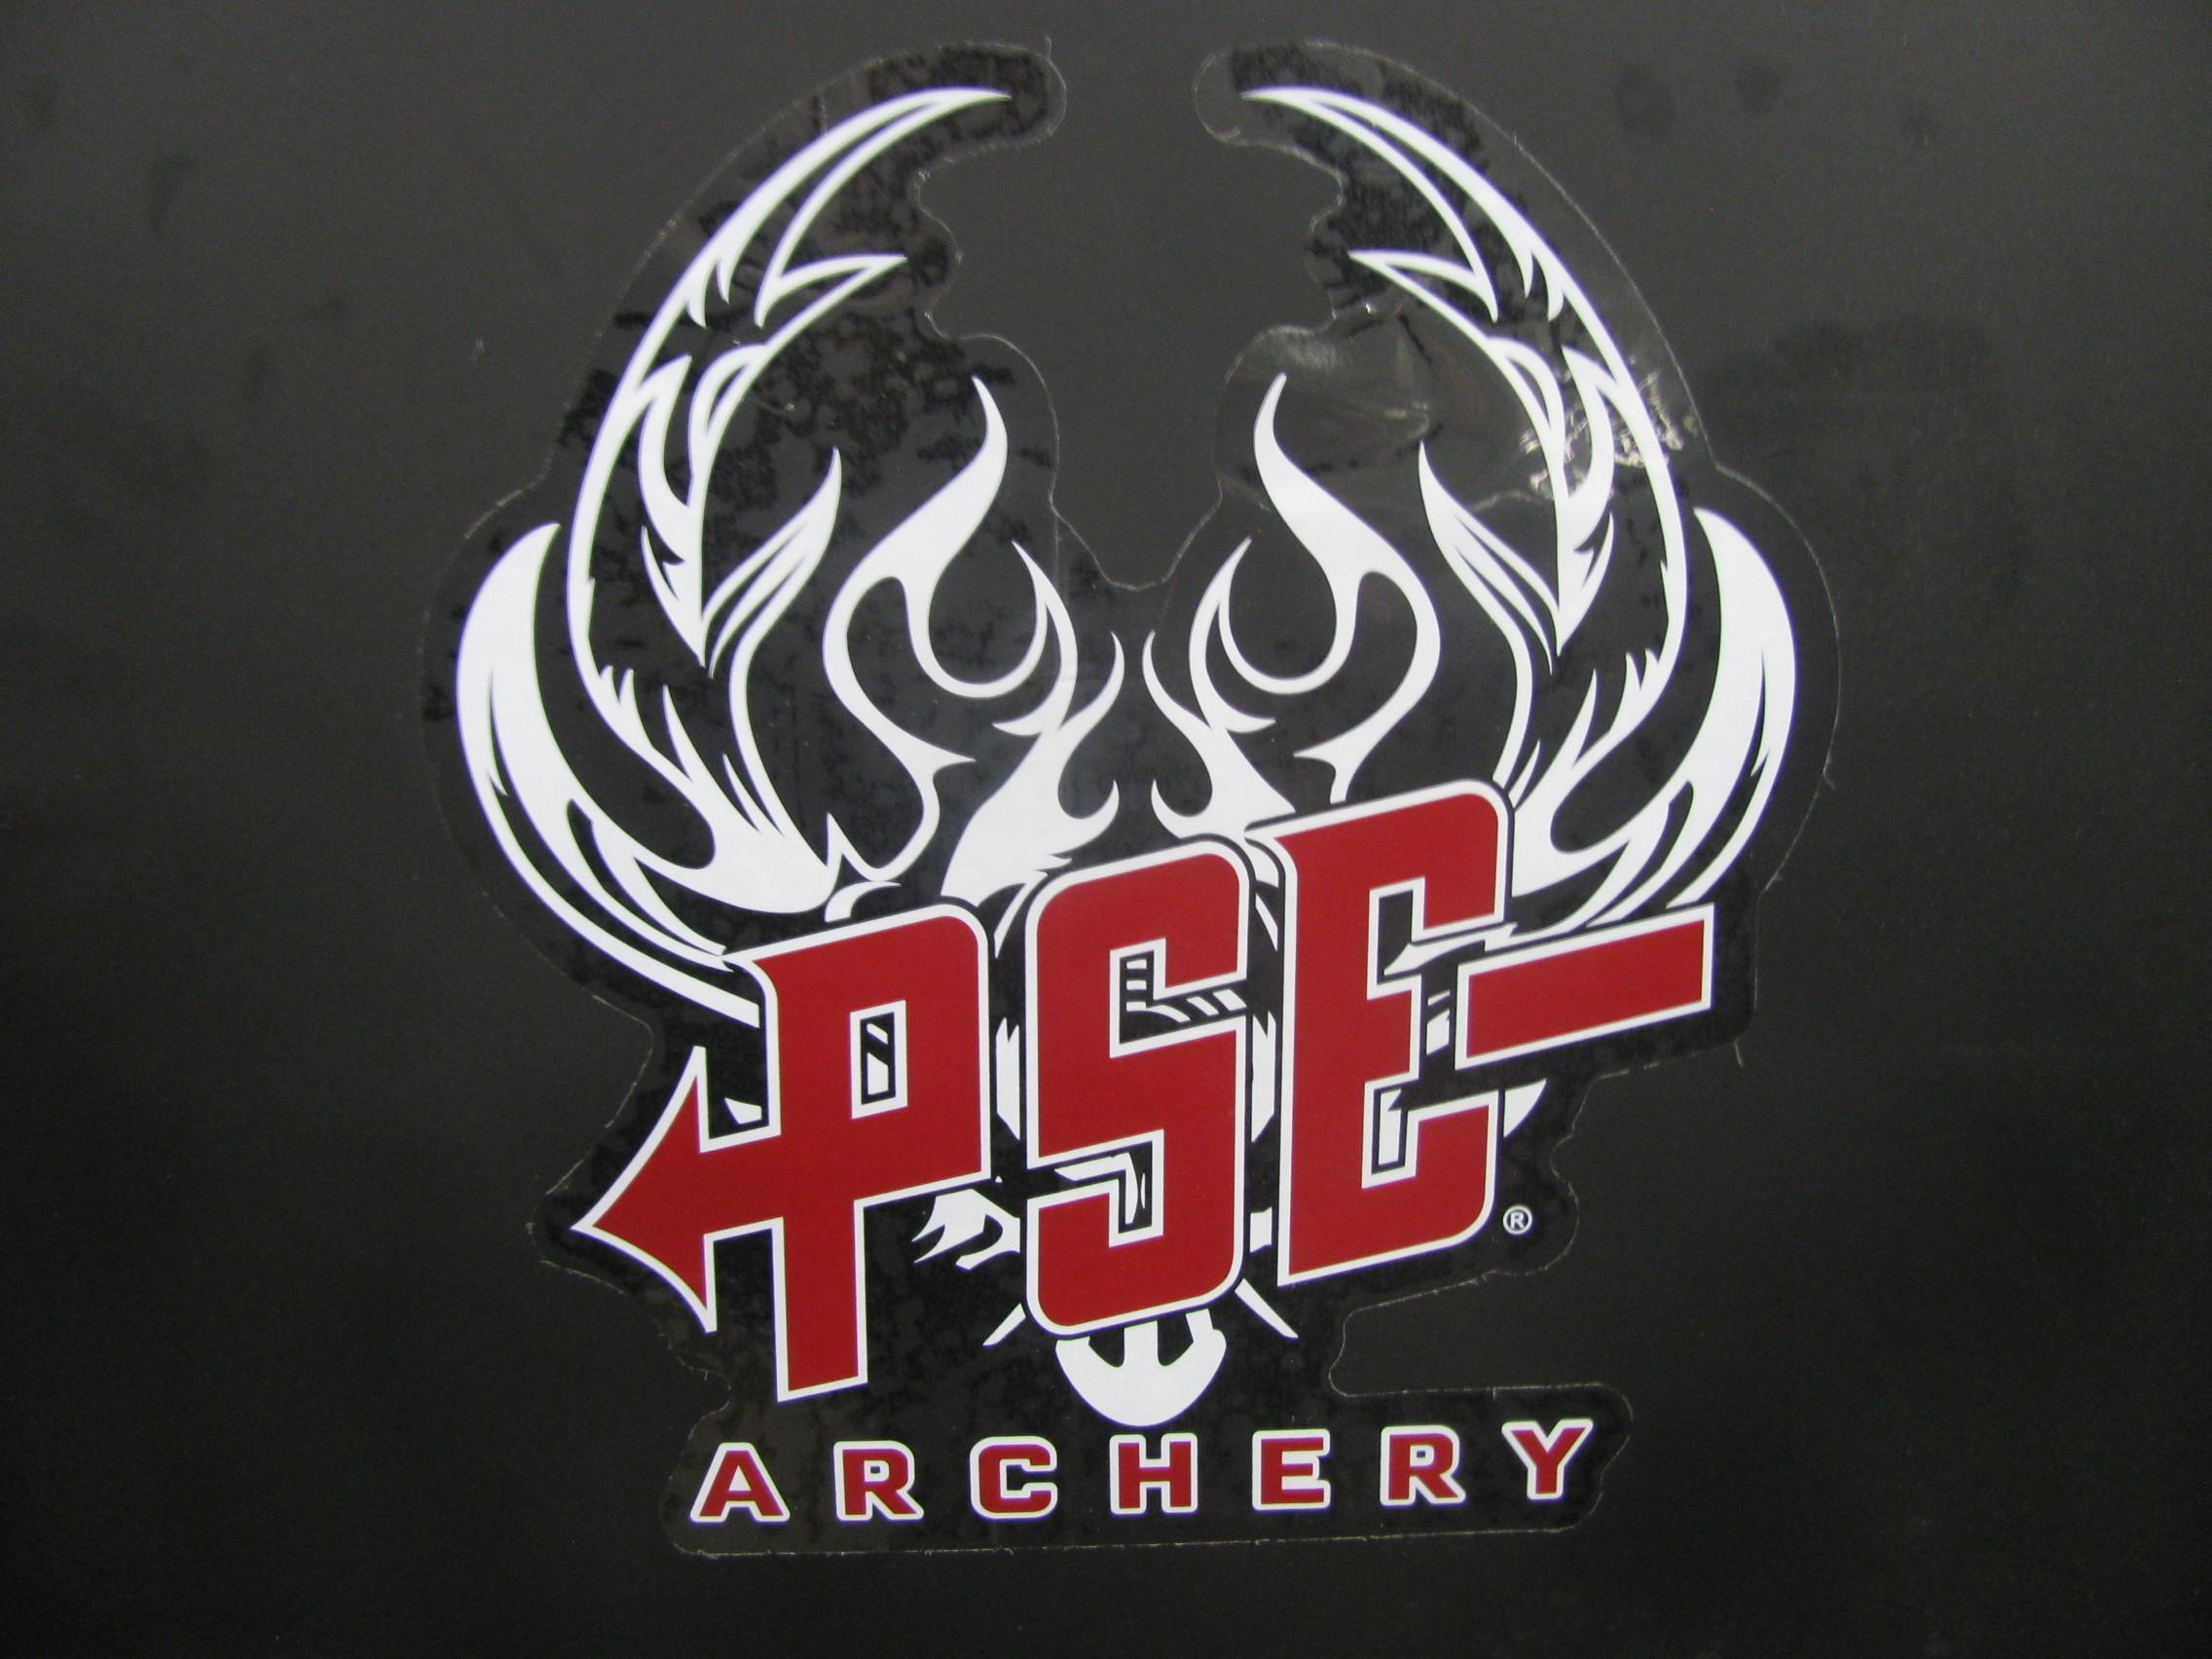 Res: 2272x1704, PSE Archery Archery Pinterest